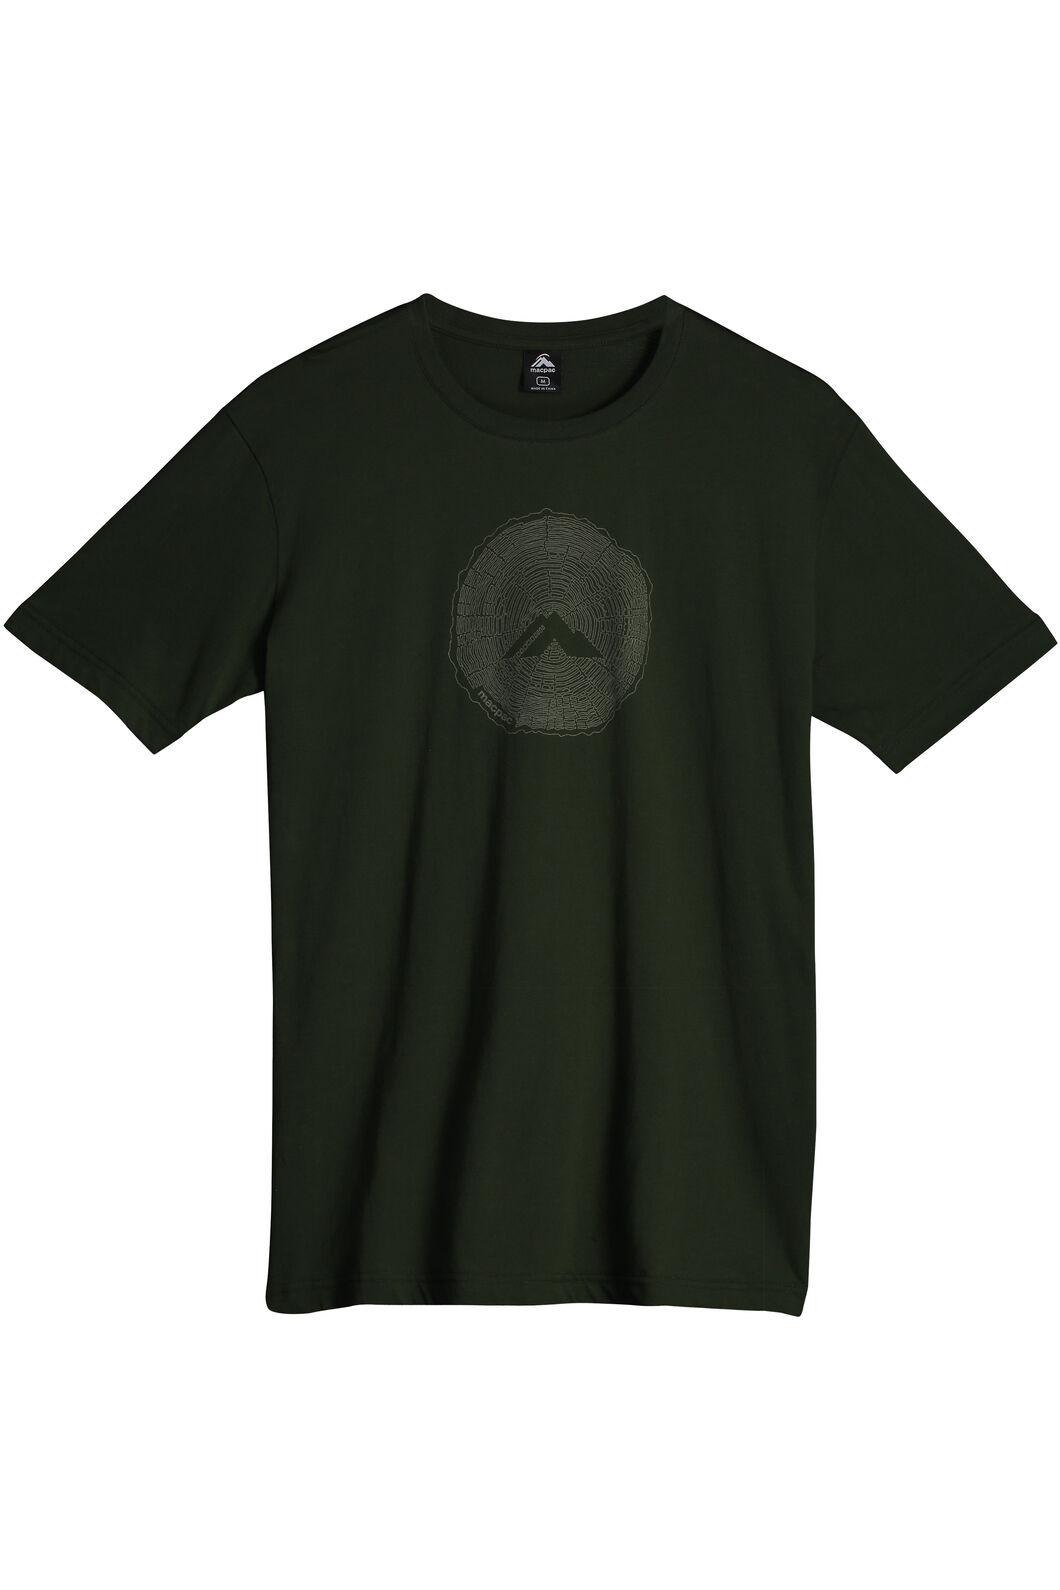 Sawcut Organic Cotton T-Shirt - Men's, Kombu Green, hi-res